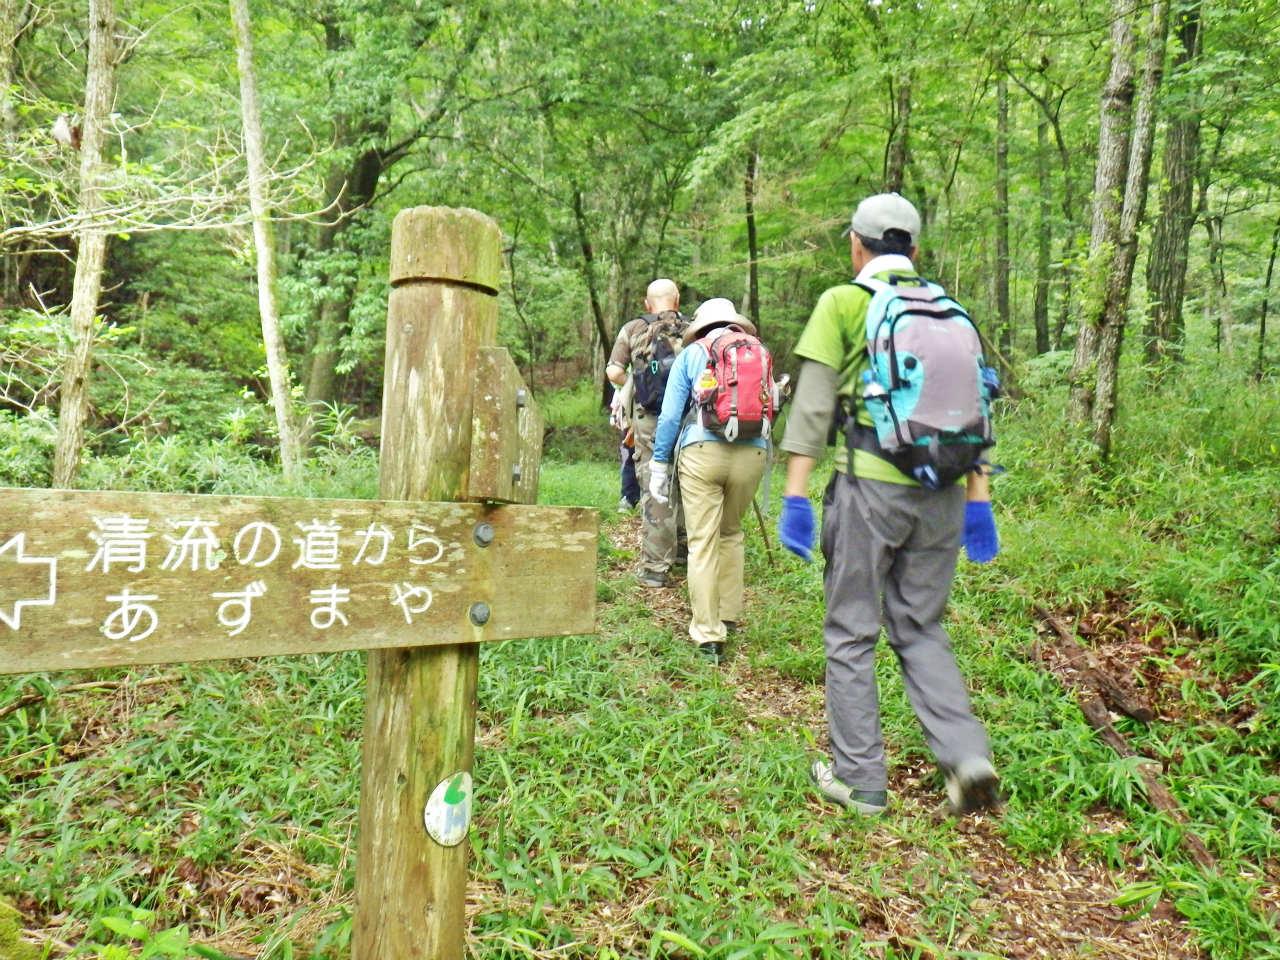 09a 金比羅道を登る